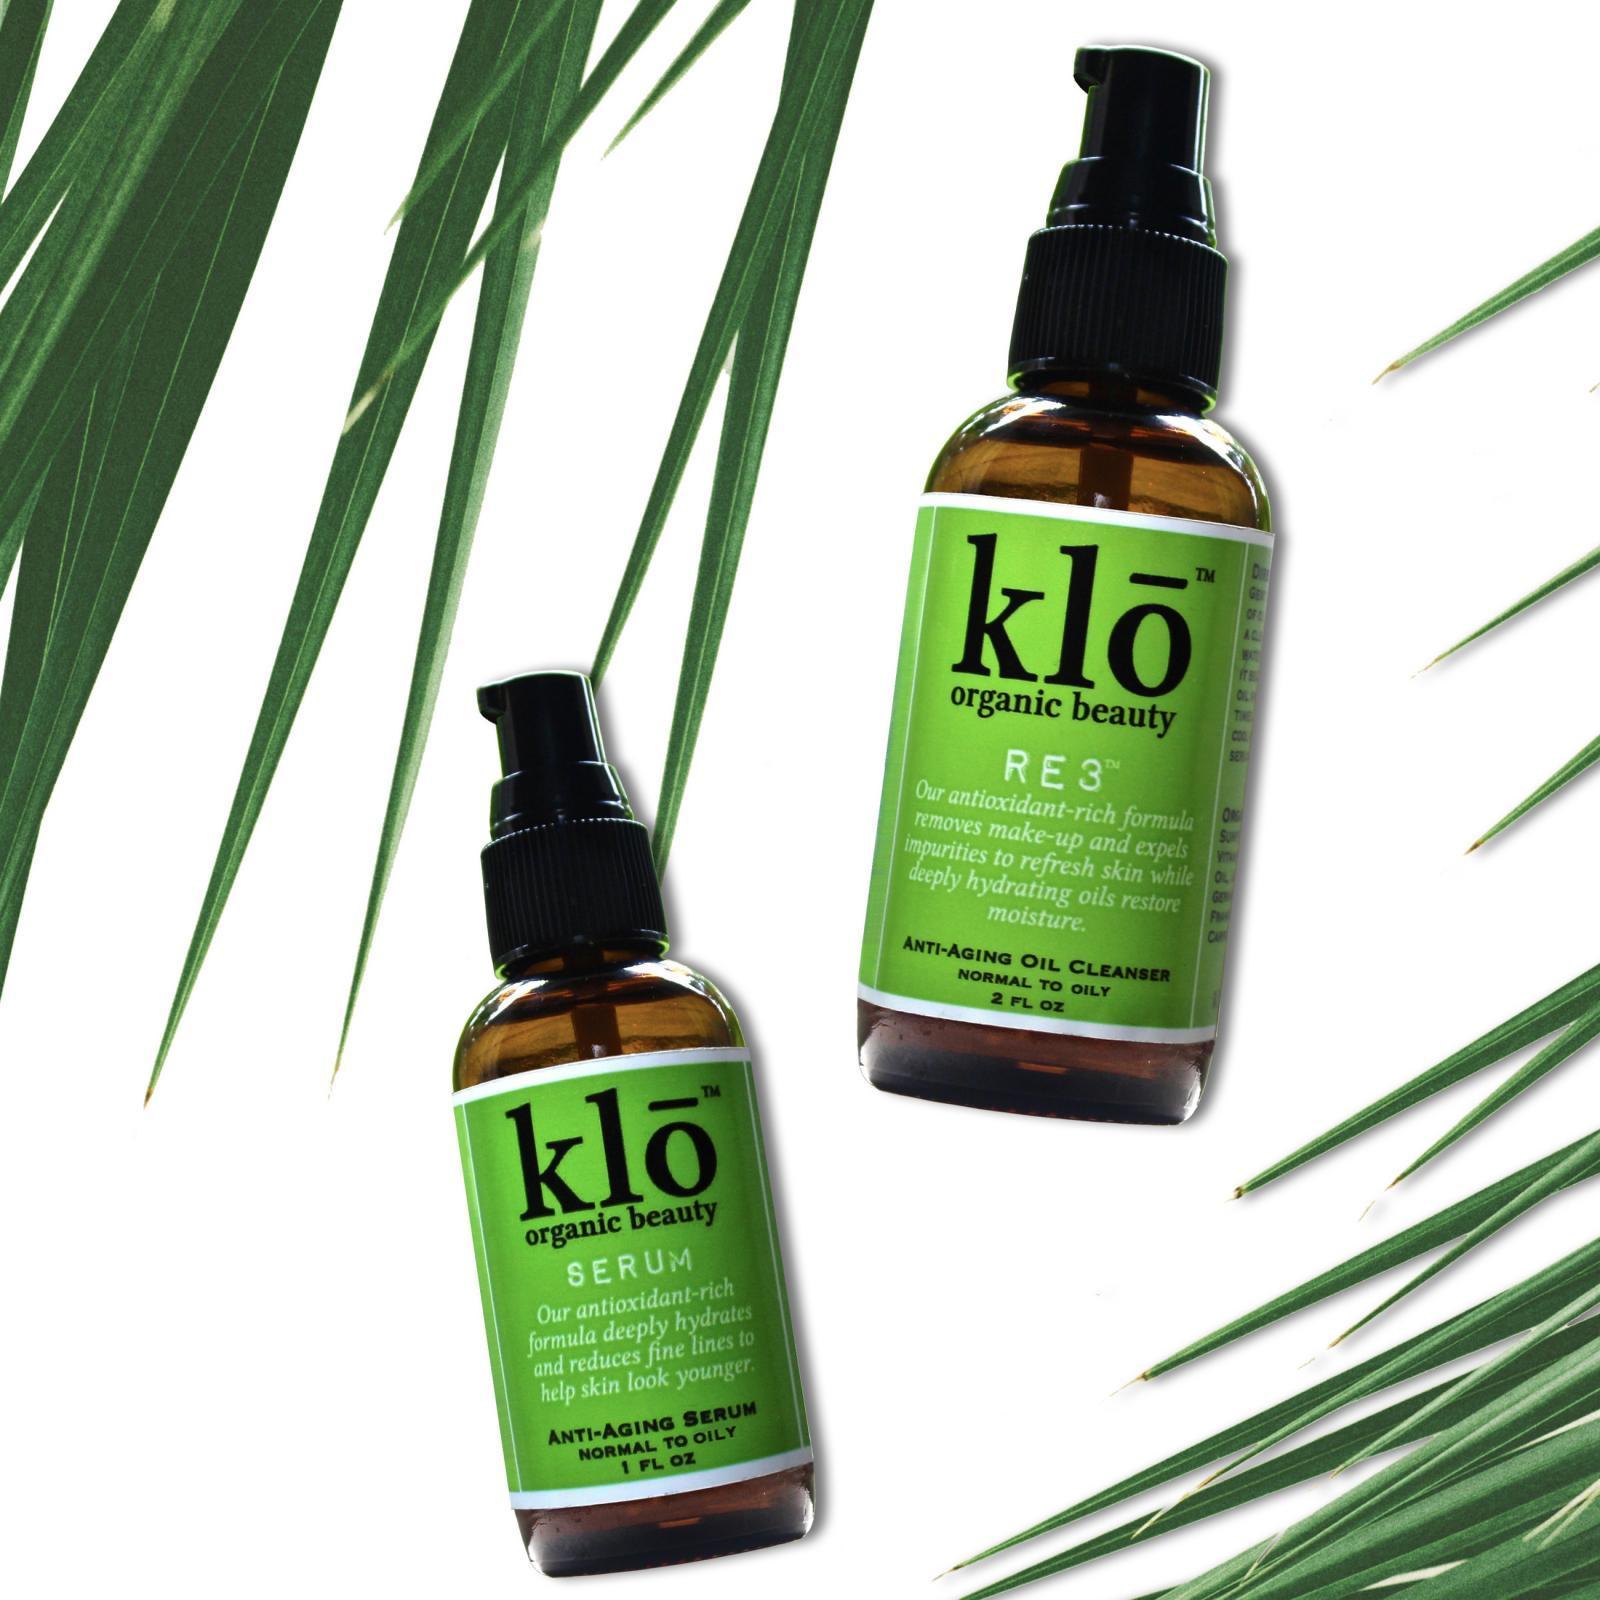 RE3 Oil Cleanser + Serum Duo (oily/acne prone skin)